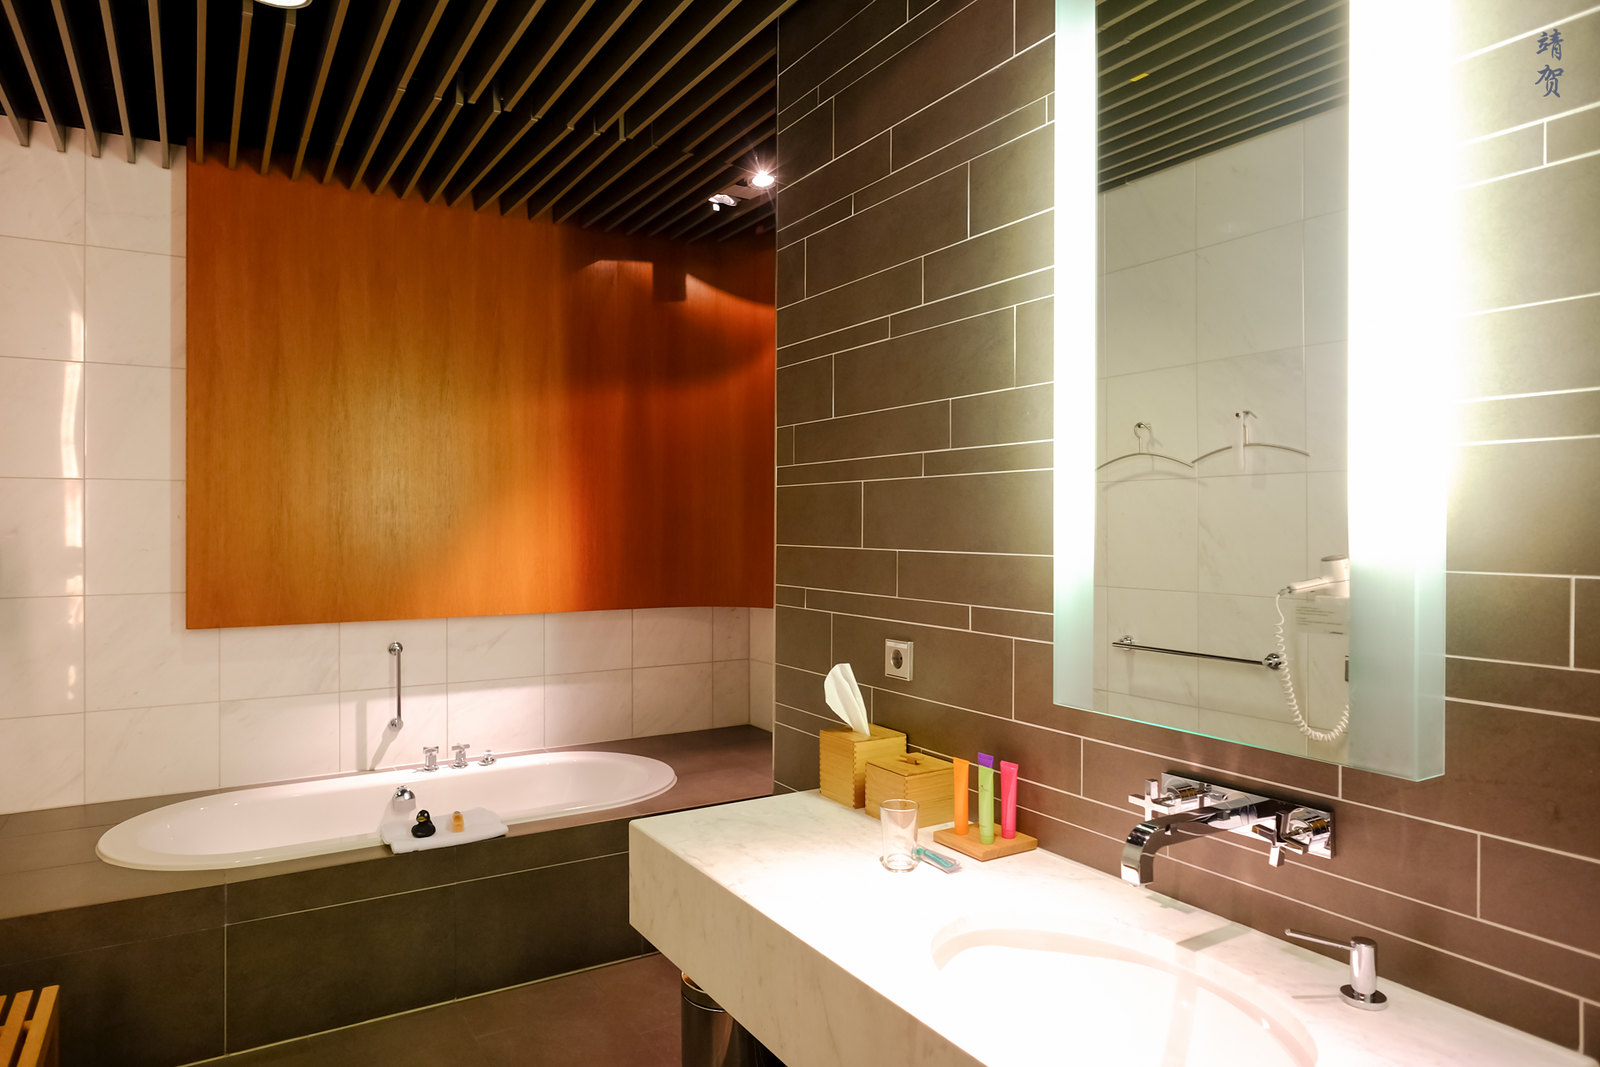 Shower room interior